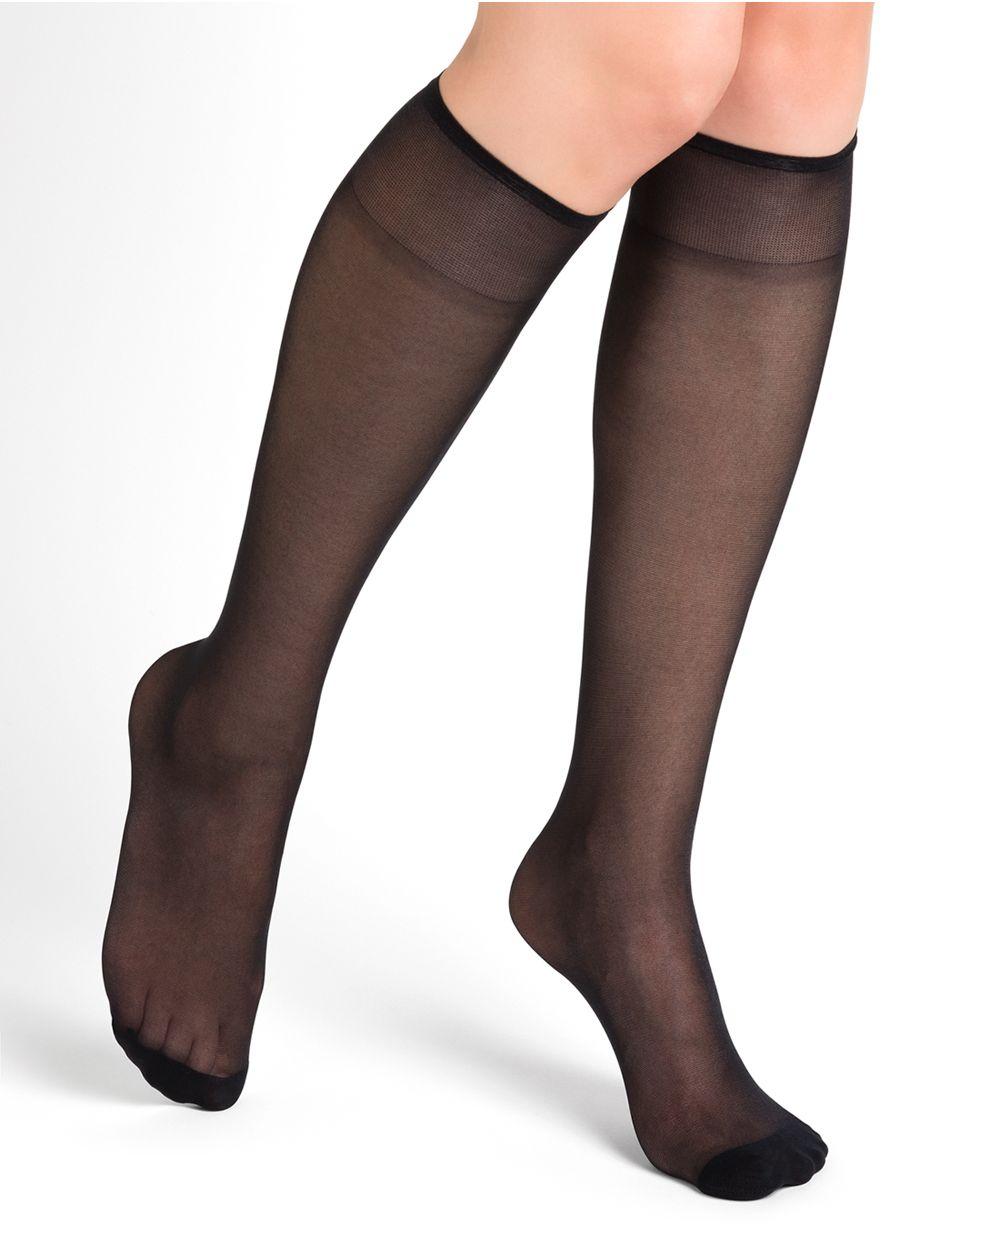 20D glossy transparent knee highs